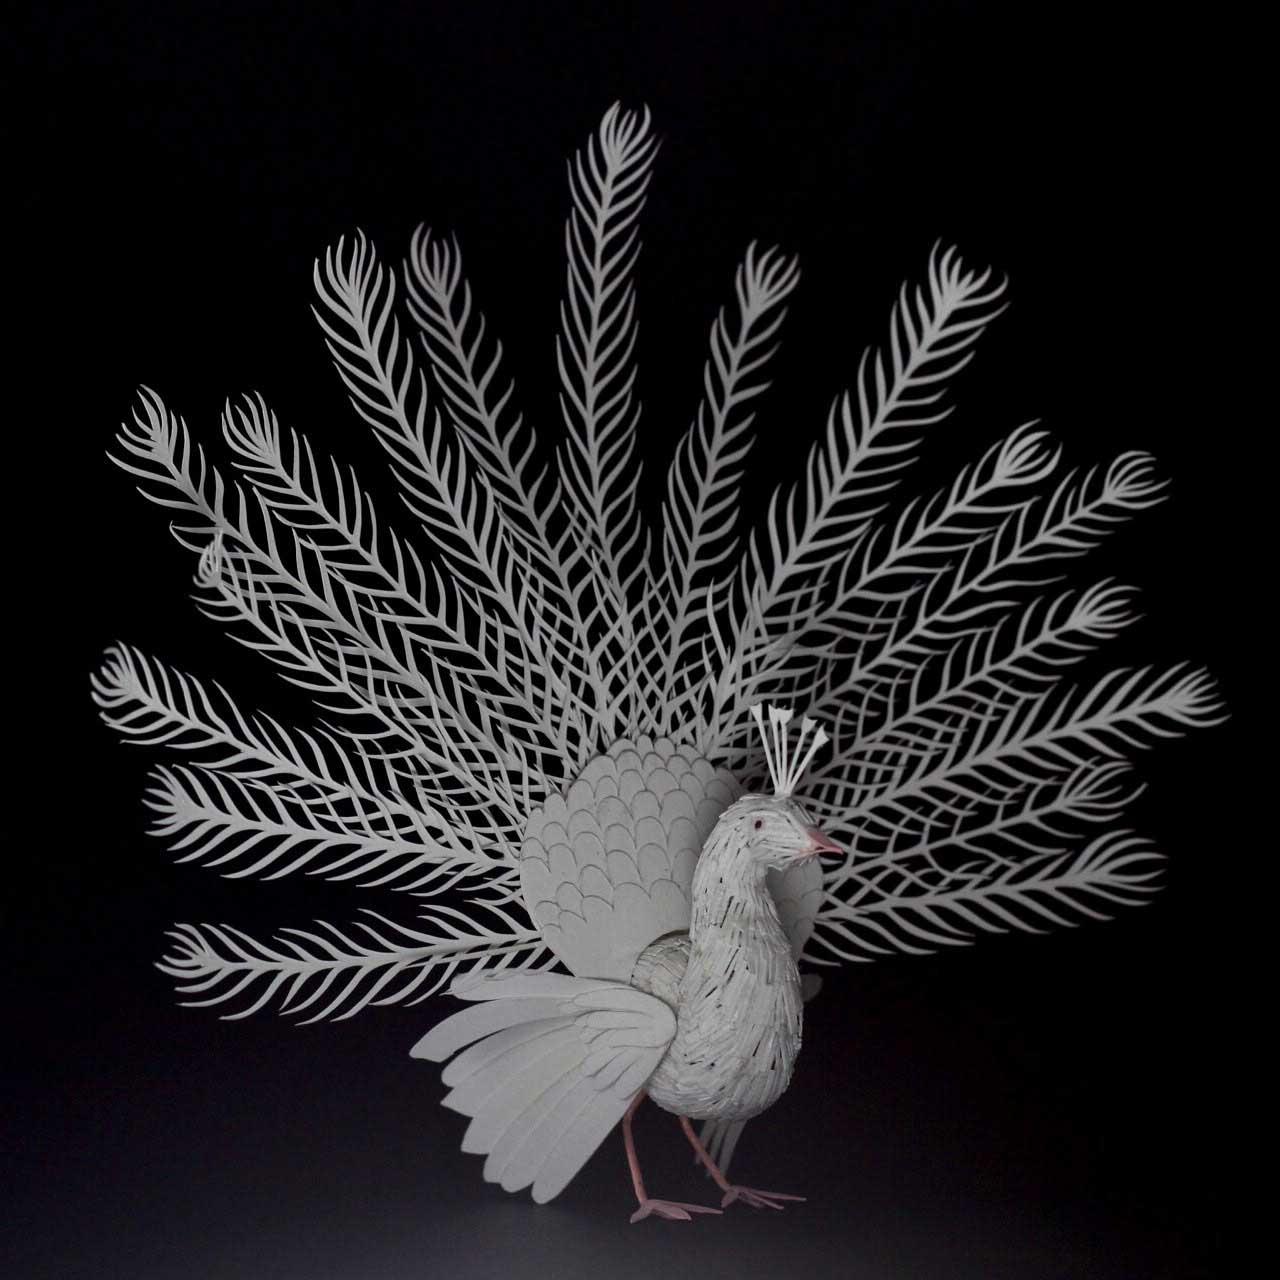 365 Papier-Vögel Nayan-and-Vaishali-miniature-birds-voegel_09